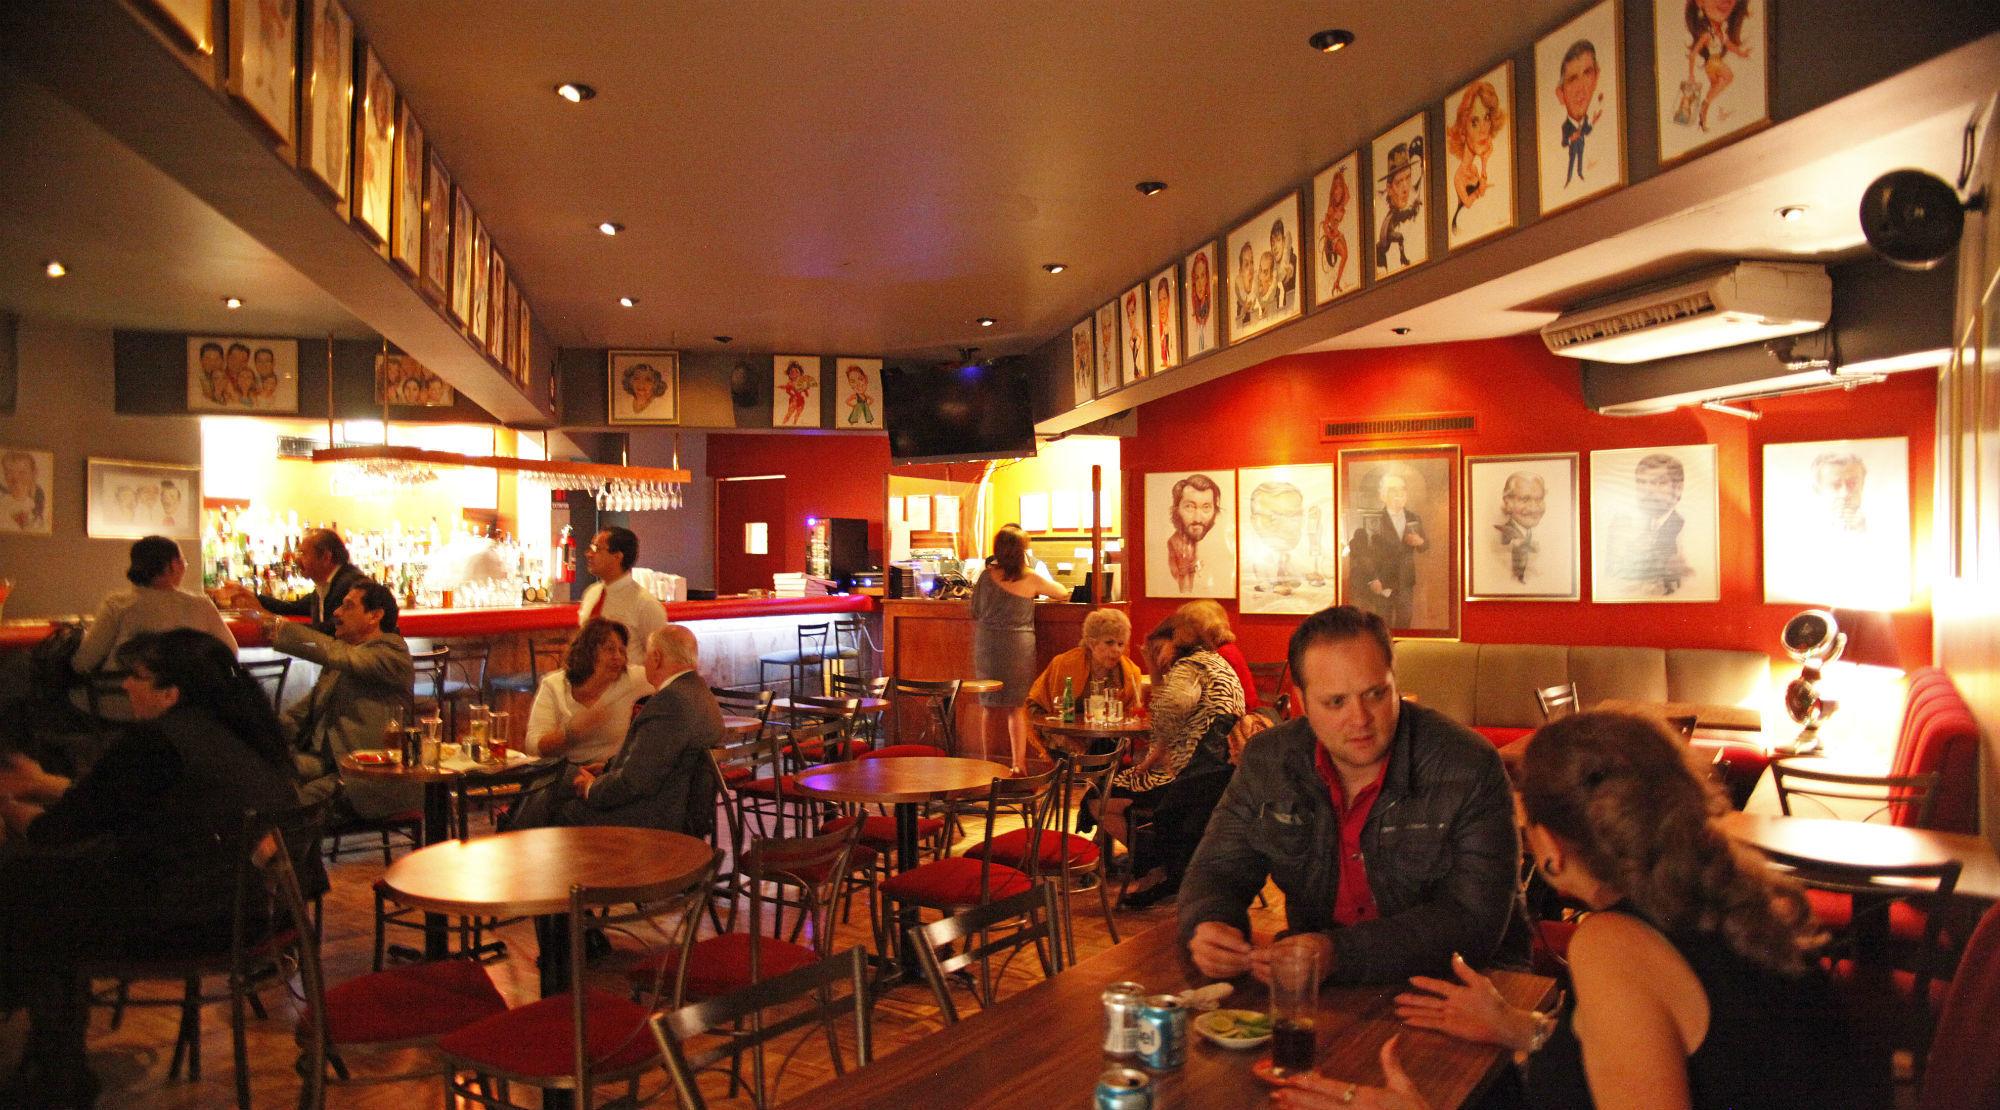 Siqueiros Bohemian Bar